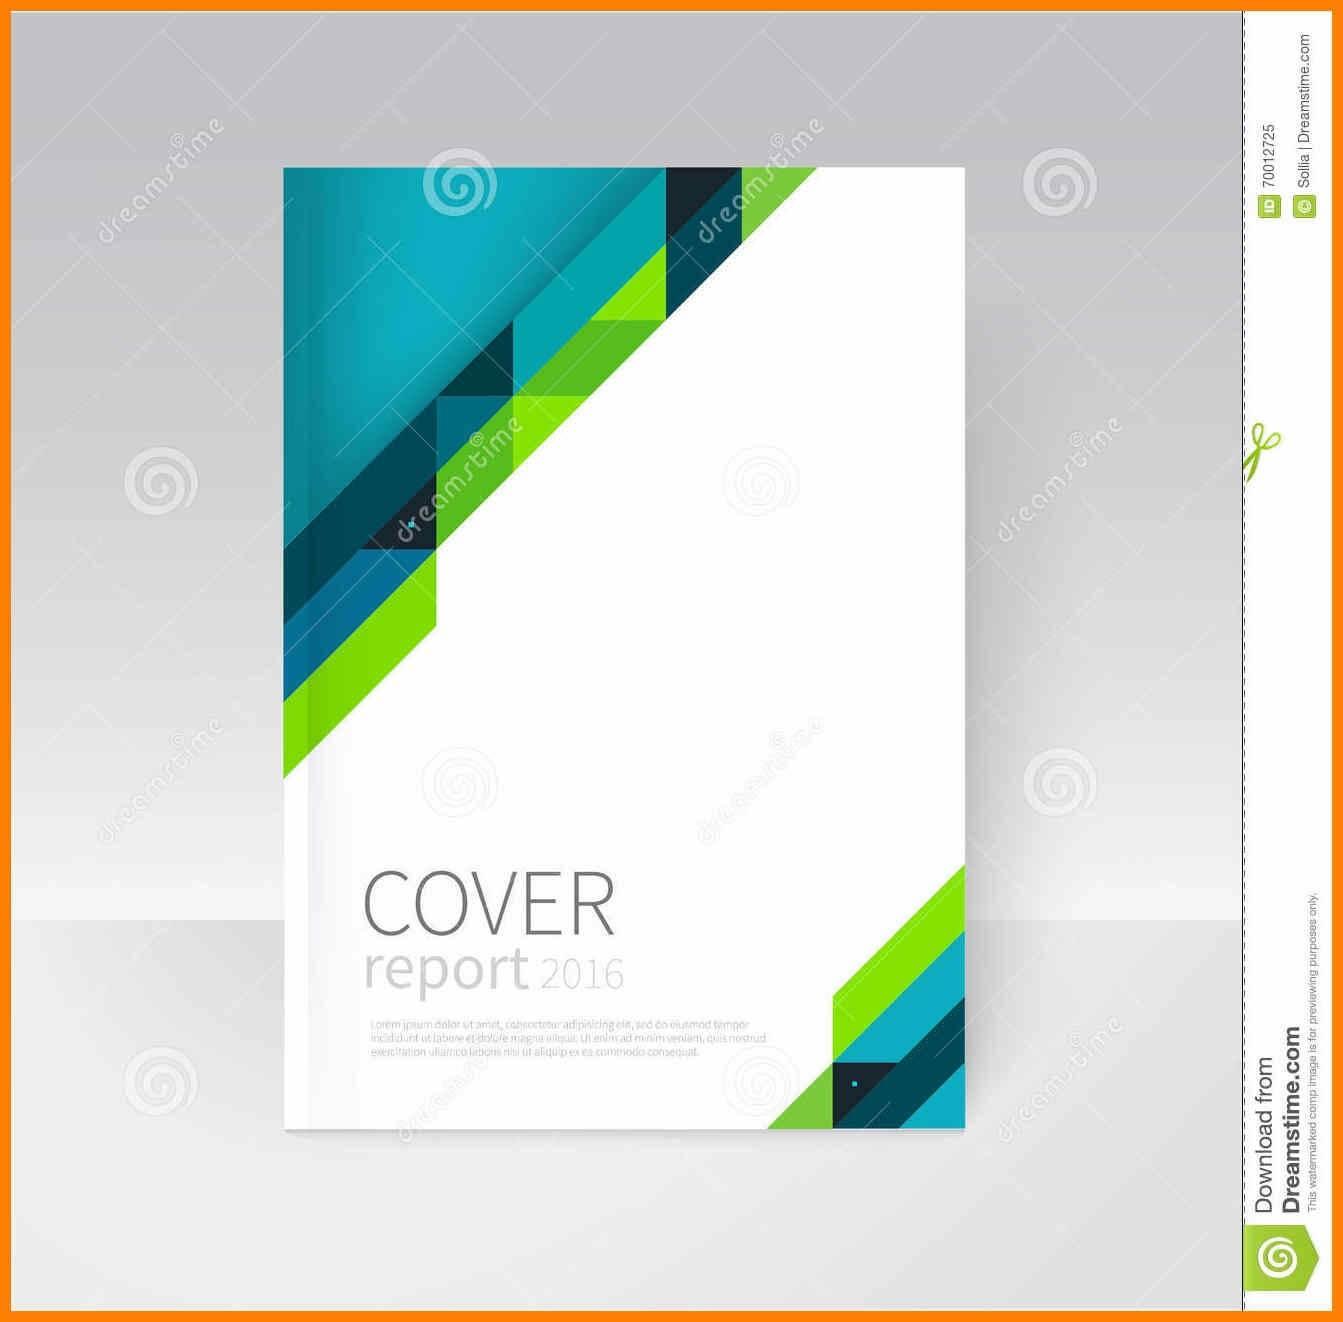 013 Microsoft Word Report Templates Template Striking Ideas with Microsoft Word Templates Reports